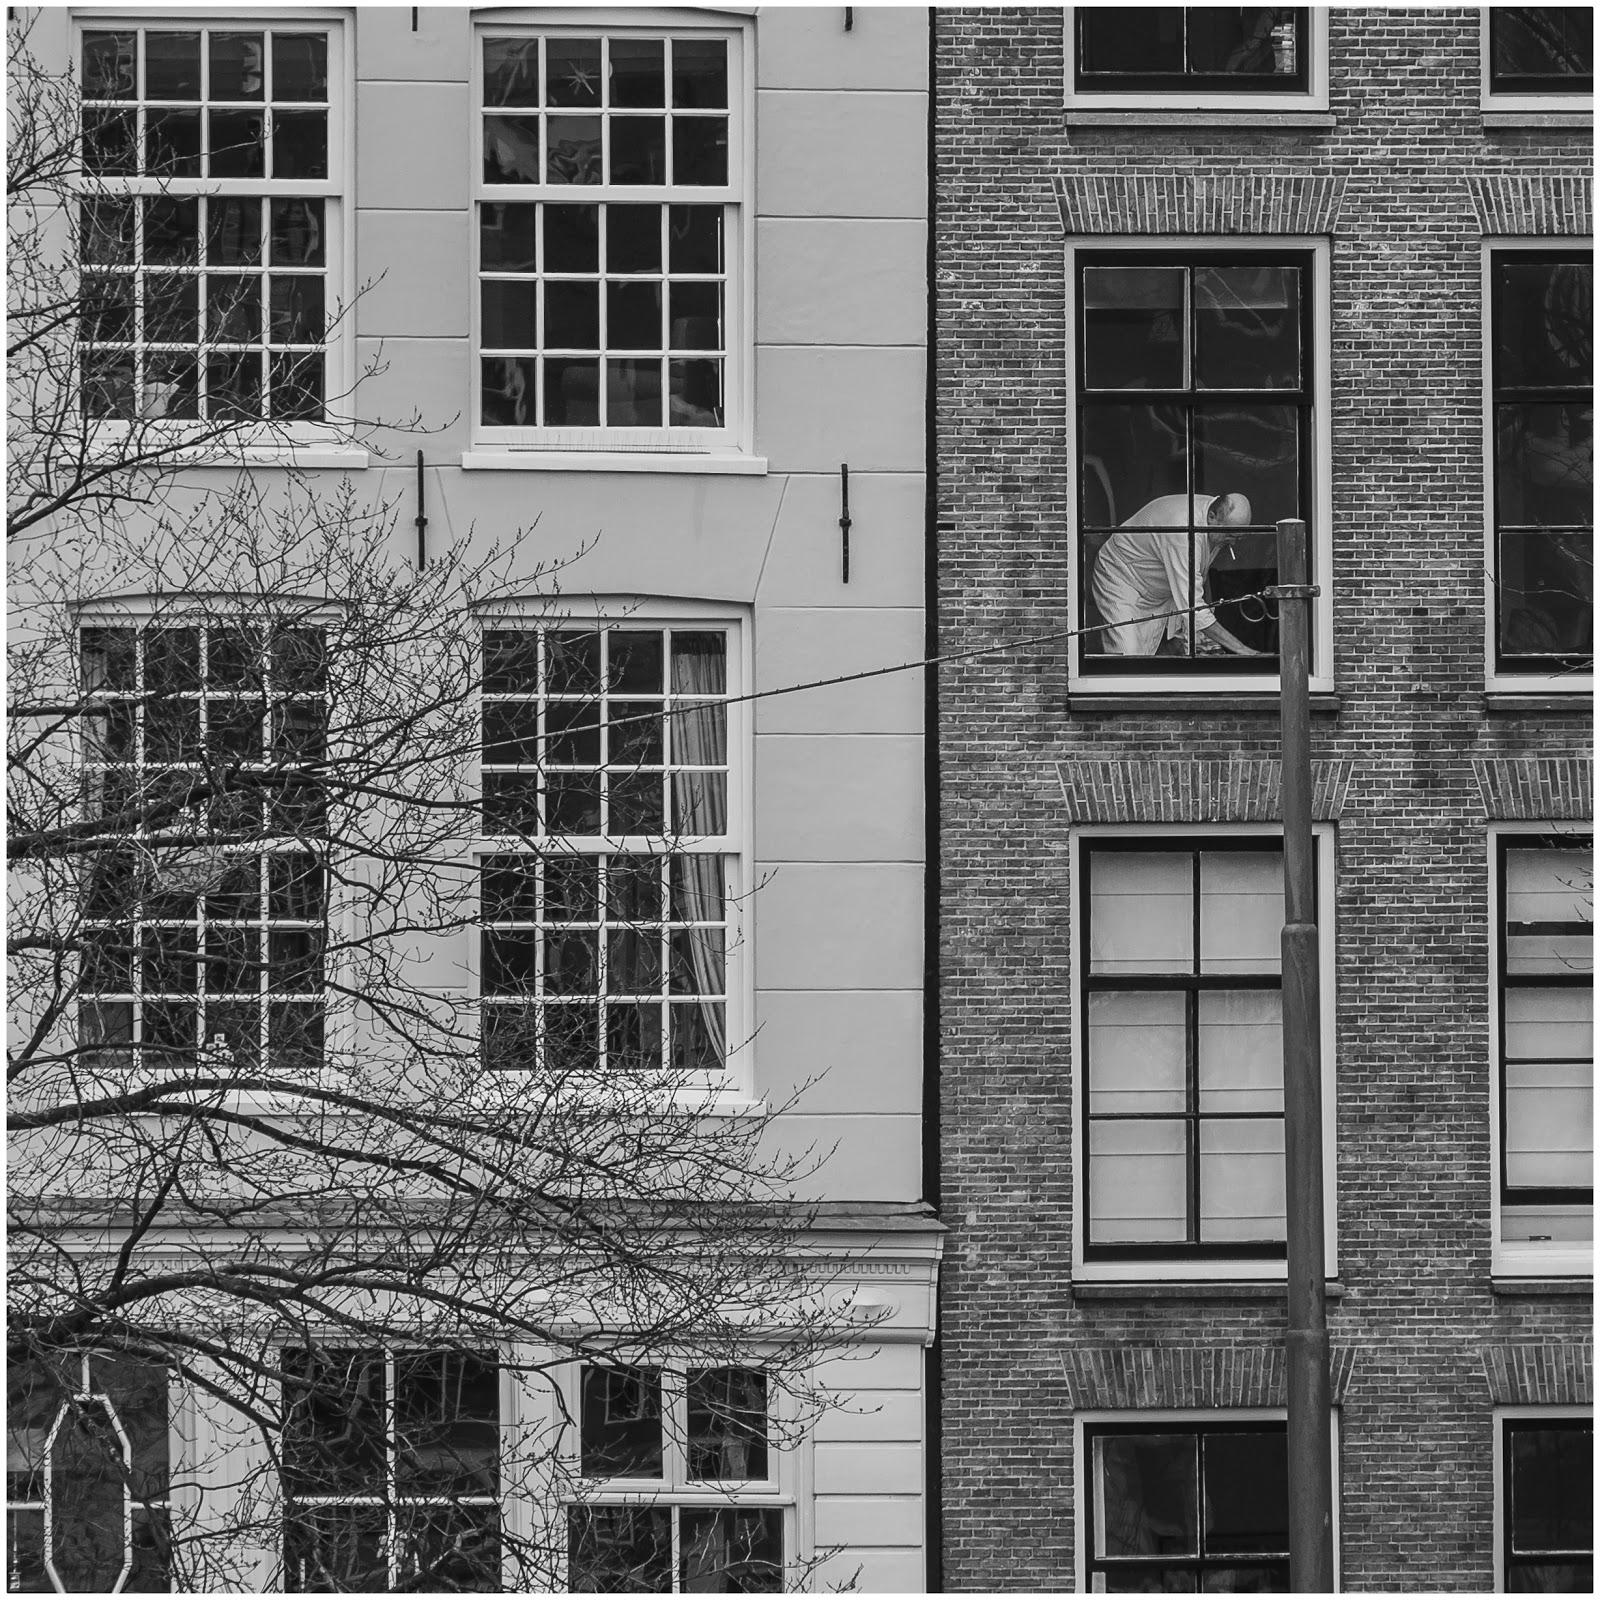 Is this streetphotography? Is dit ook straatfotografie?